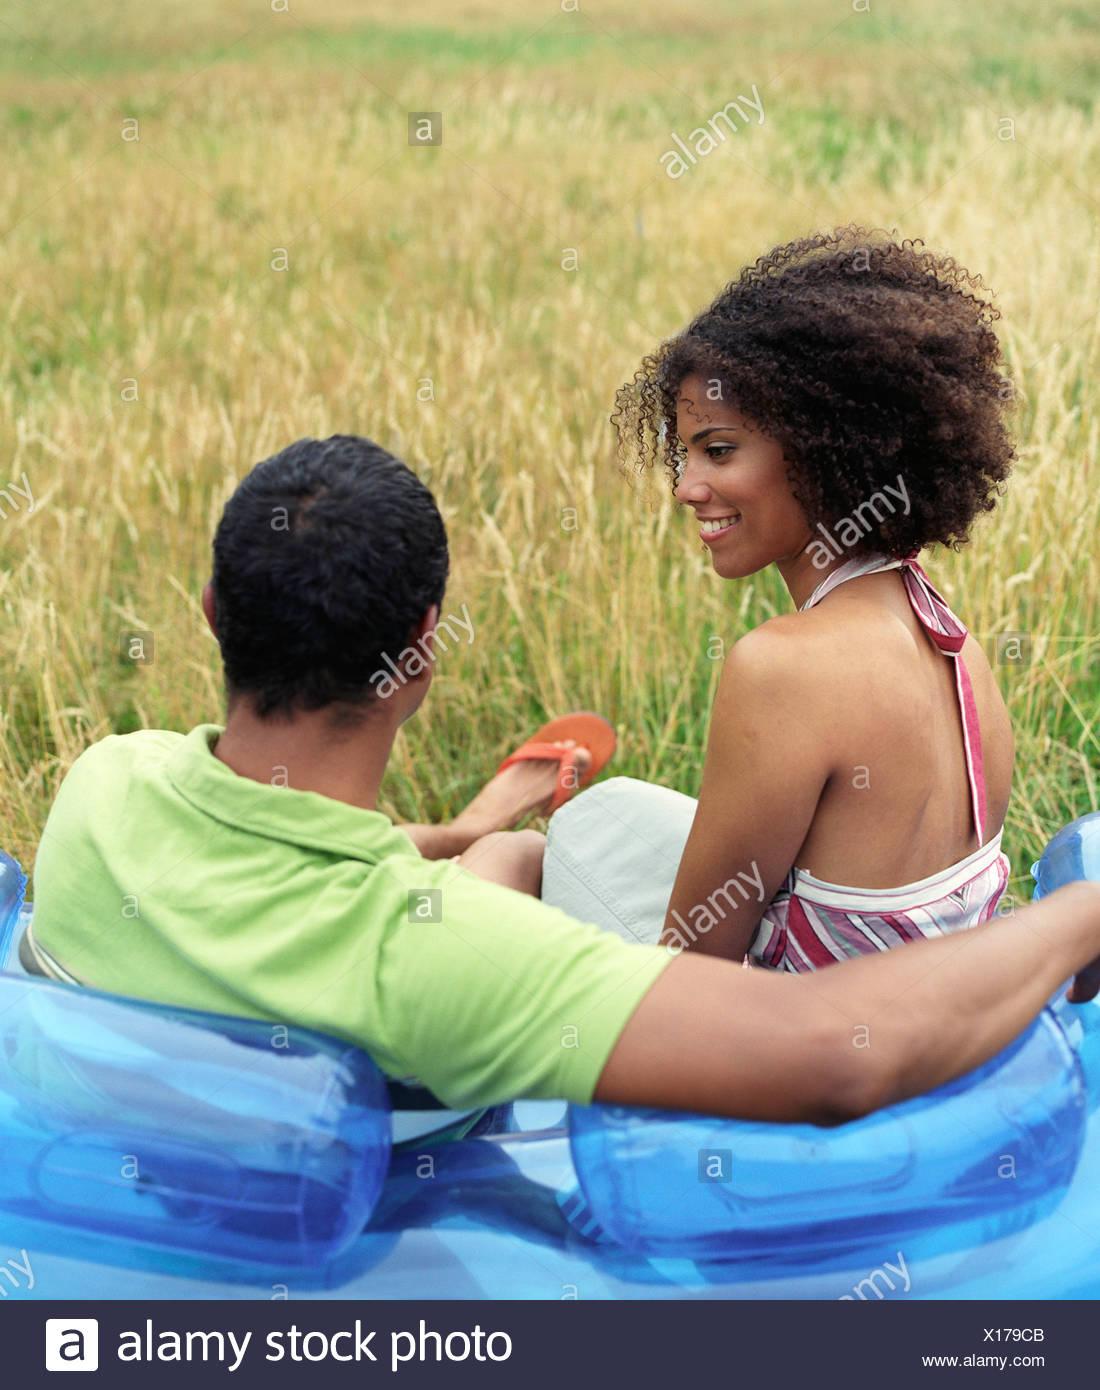 Couple sitting on blow up sofa outside - Stock Image